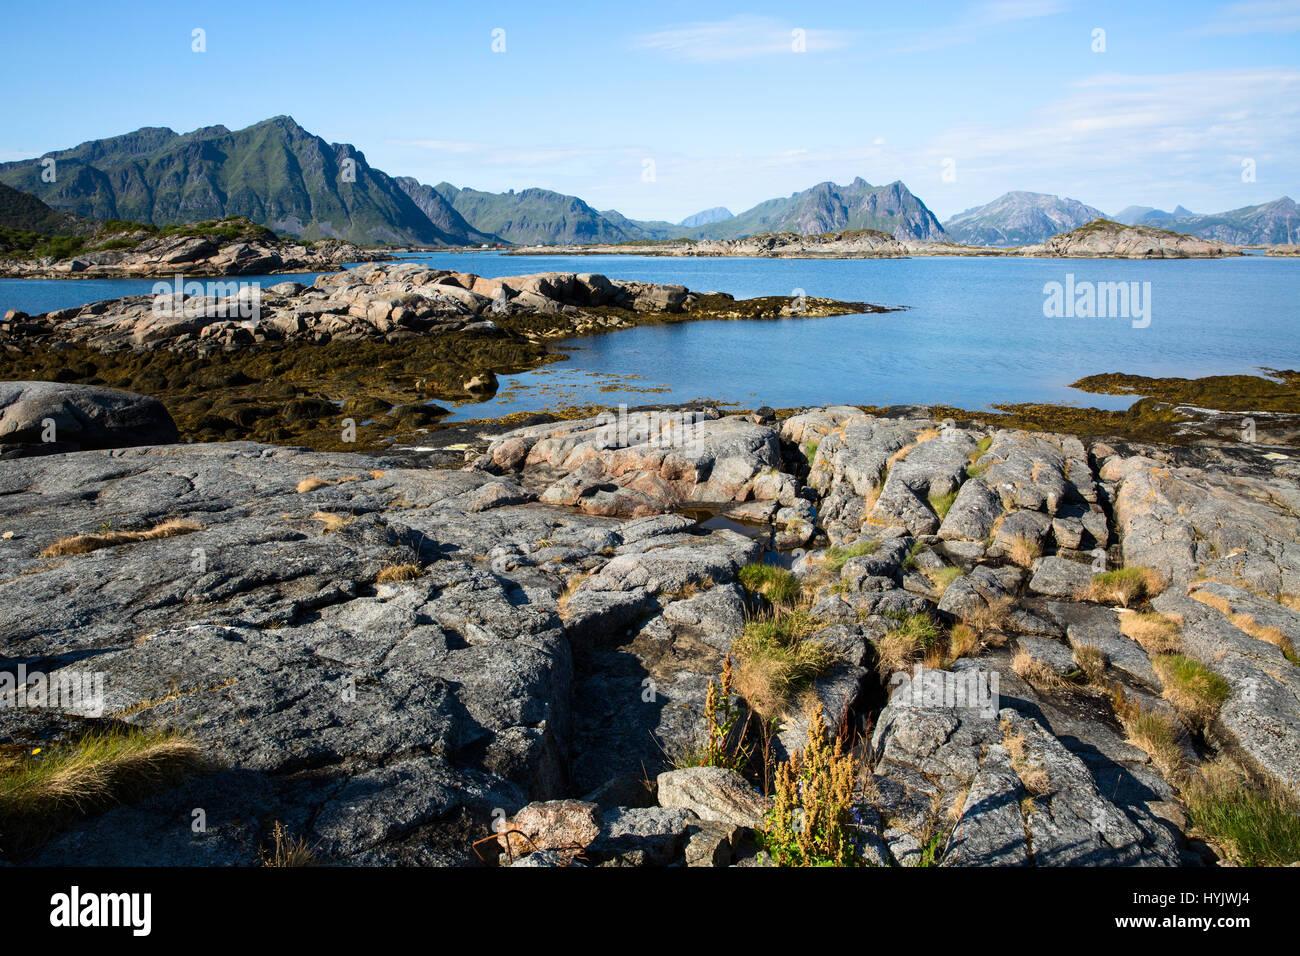 Europe,Norway,Lofoten,Vestvagoy,landscapes - Stock Image